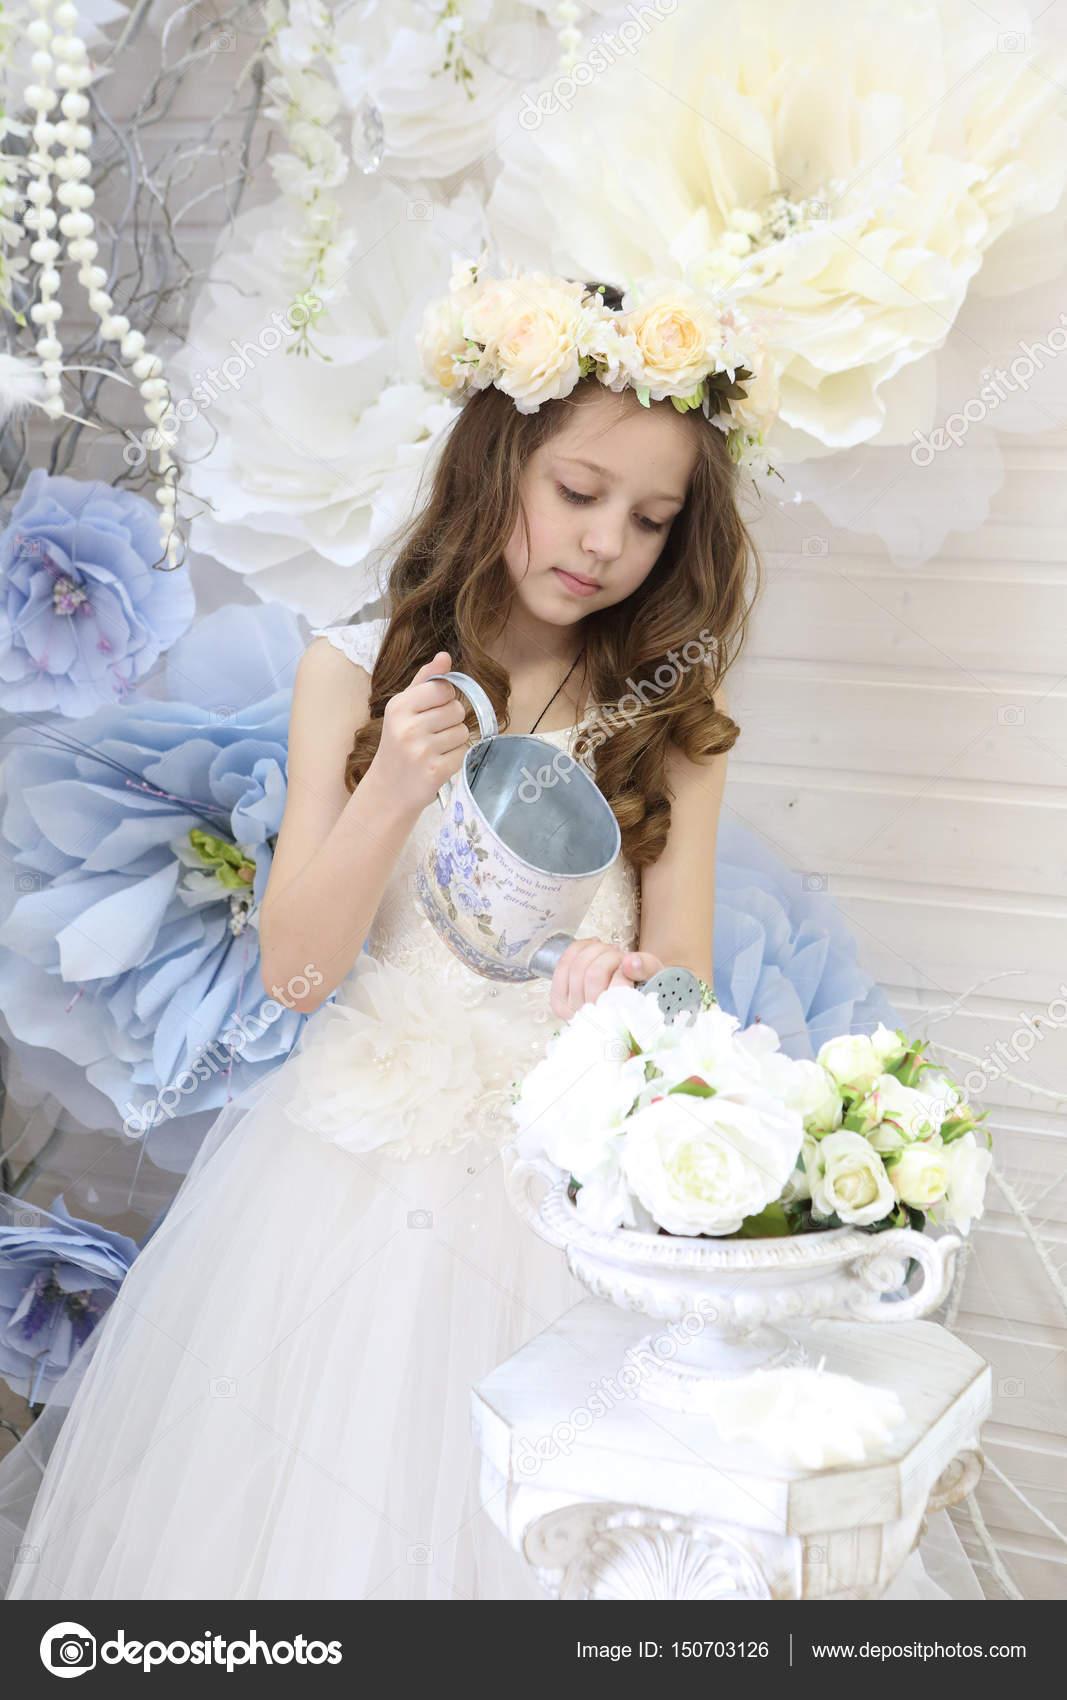 e3aea87706f2 Κορίτσι με μακριά μαλλιά με ένα στεφάνι και ένα λευκό φόρεμα πότισμα  λουλουδιών από ένα πότισμα ca — Εικόνα από DmZo